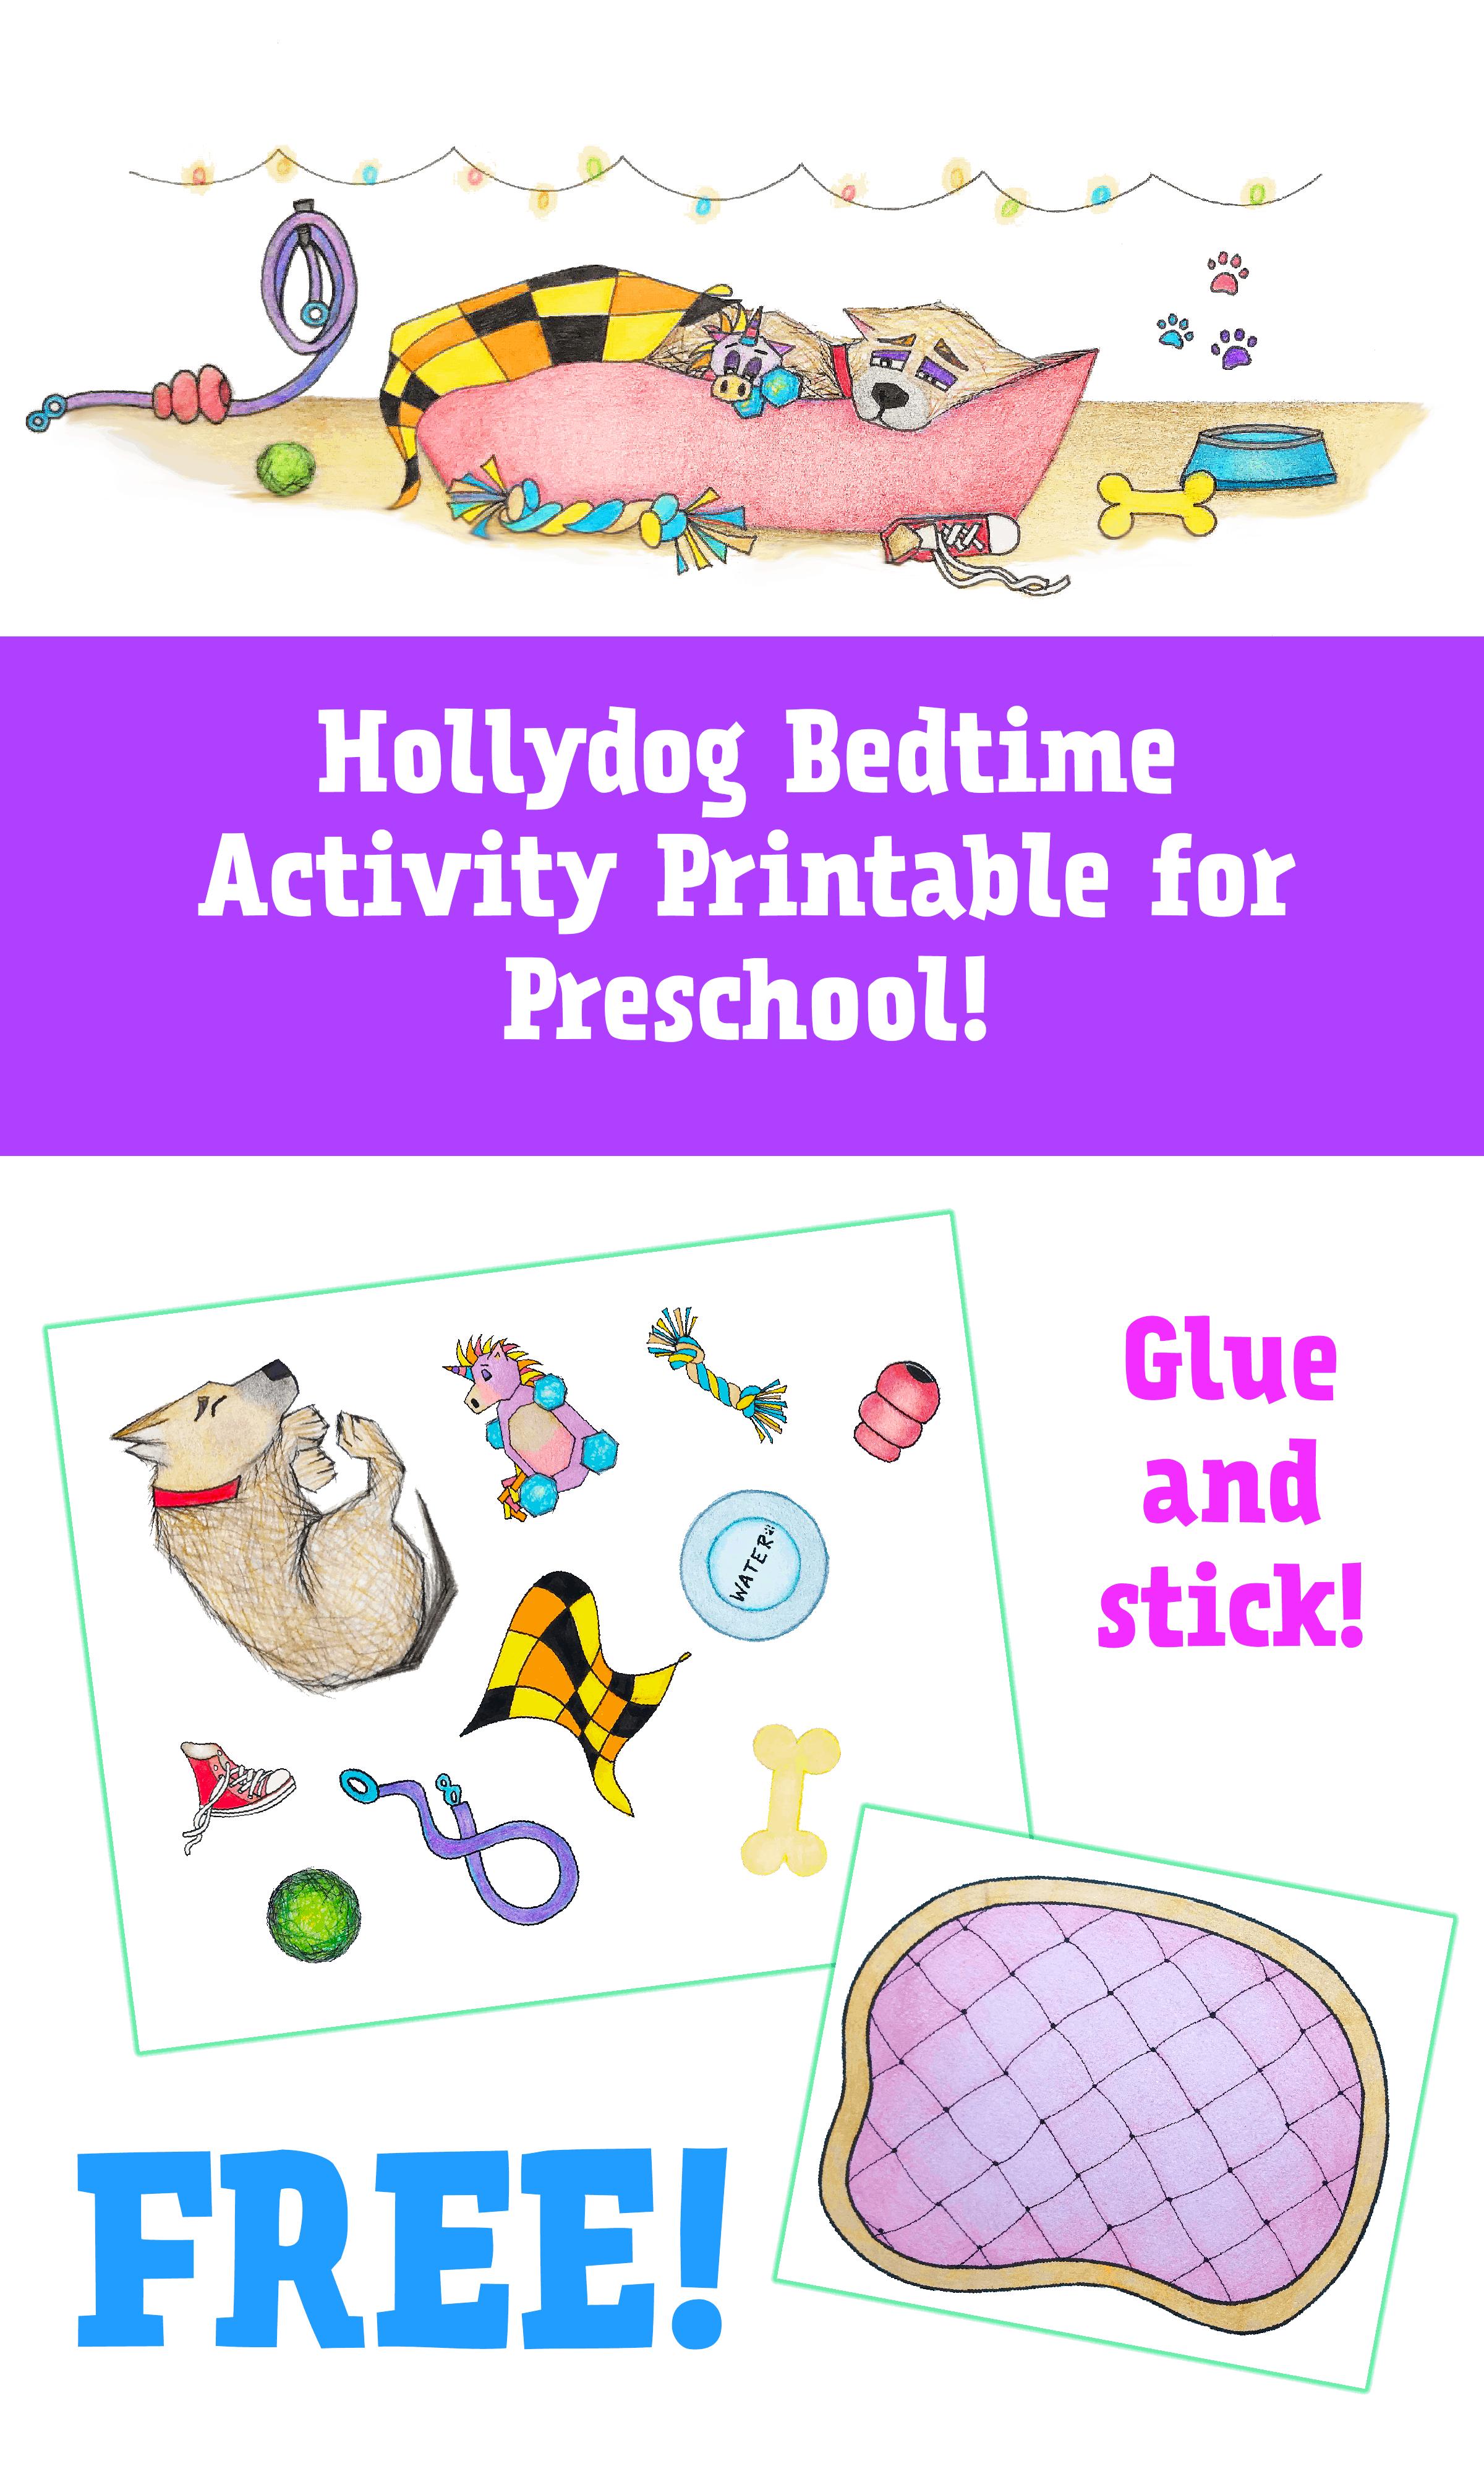 Hollydog Bedtime Activity Printable for Preschool